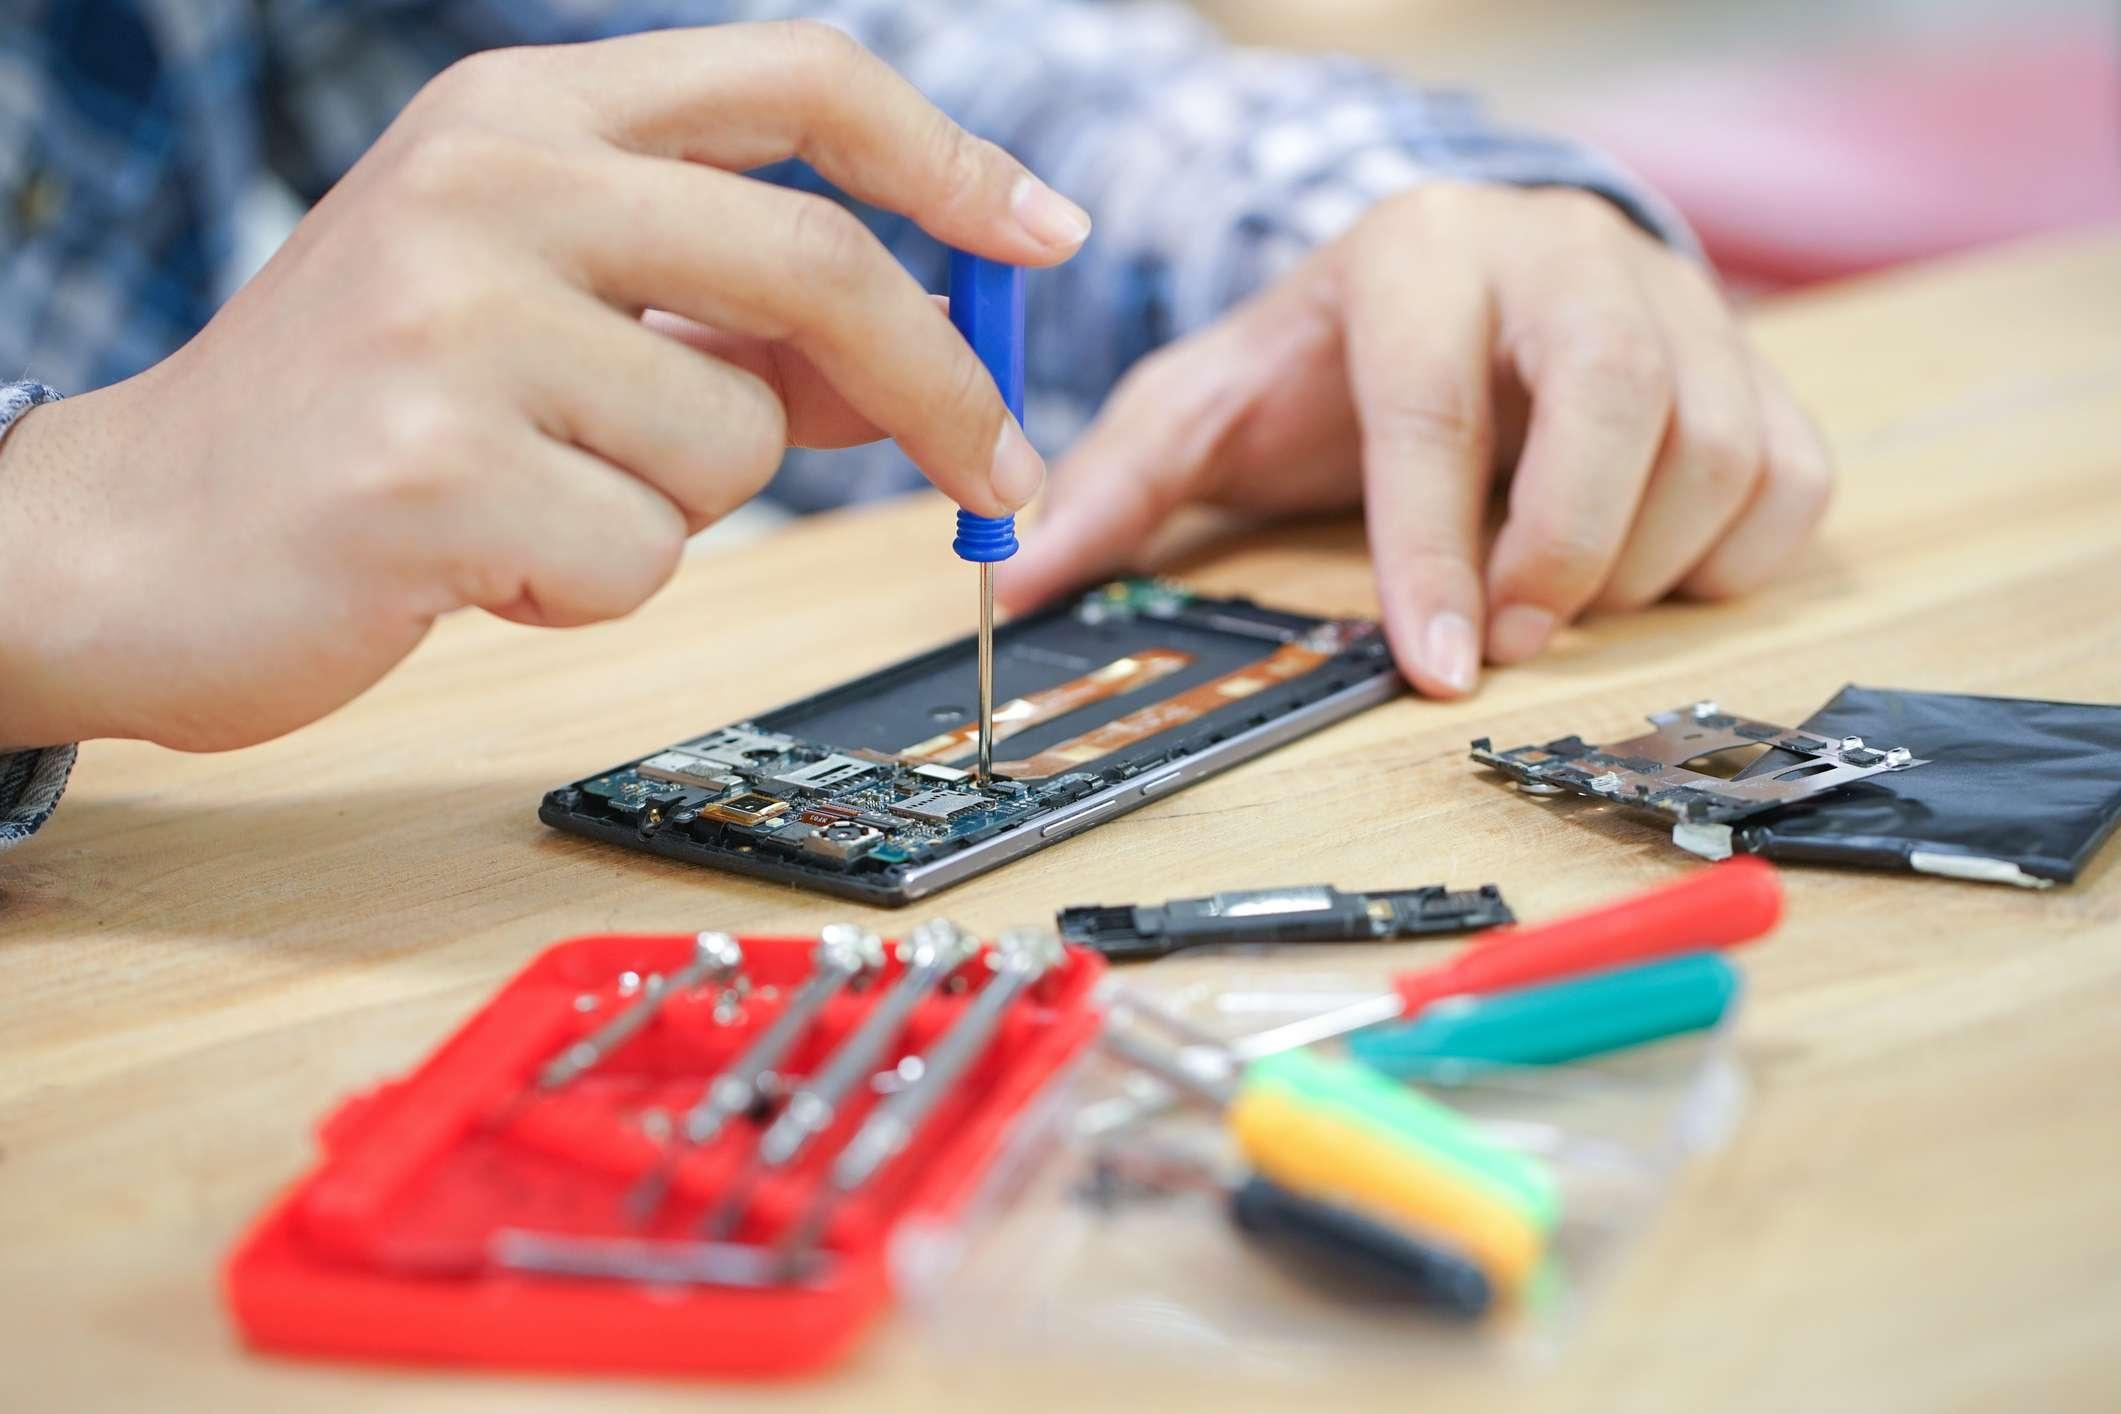 Hands repairing an electronic.